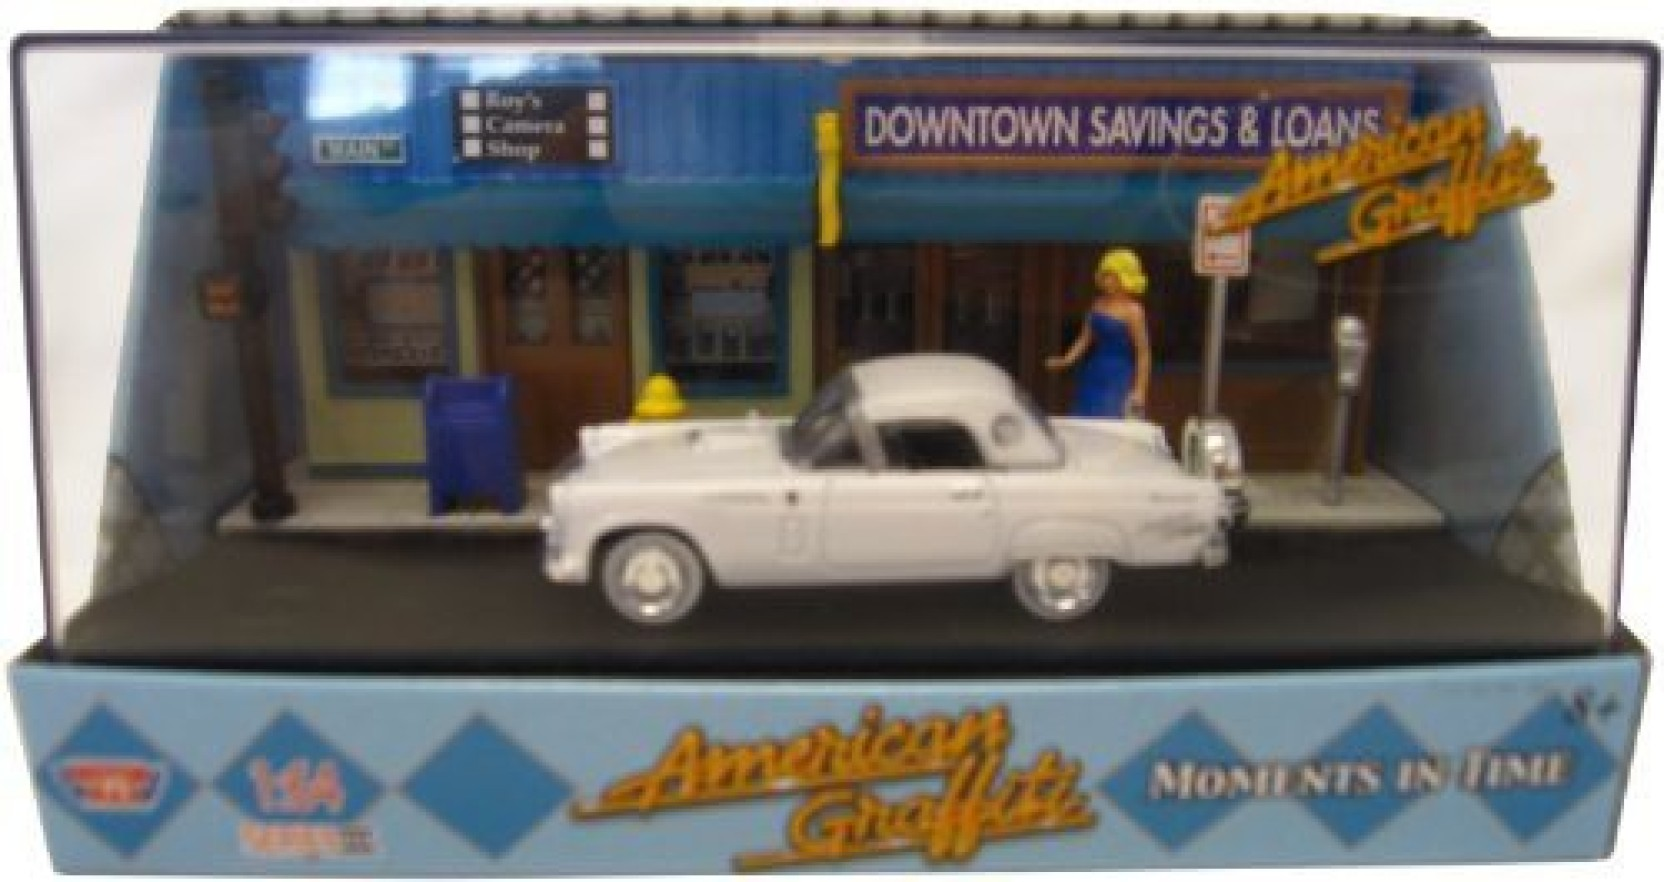 Motormax 164 Die Cast Ford American Graffiti Downtown Diorama 1 1948 Truck S Big Diwali Sale Ends In01 Days 18 Hrs 29 Mins 40 Secs